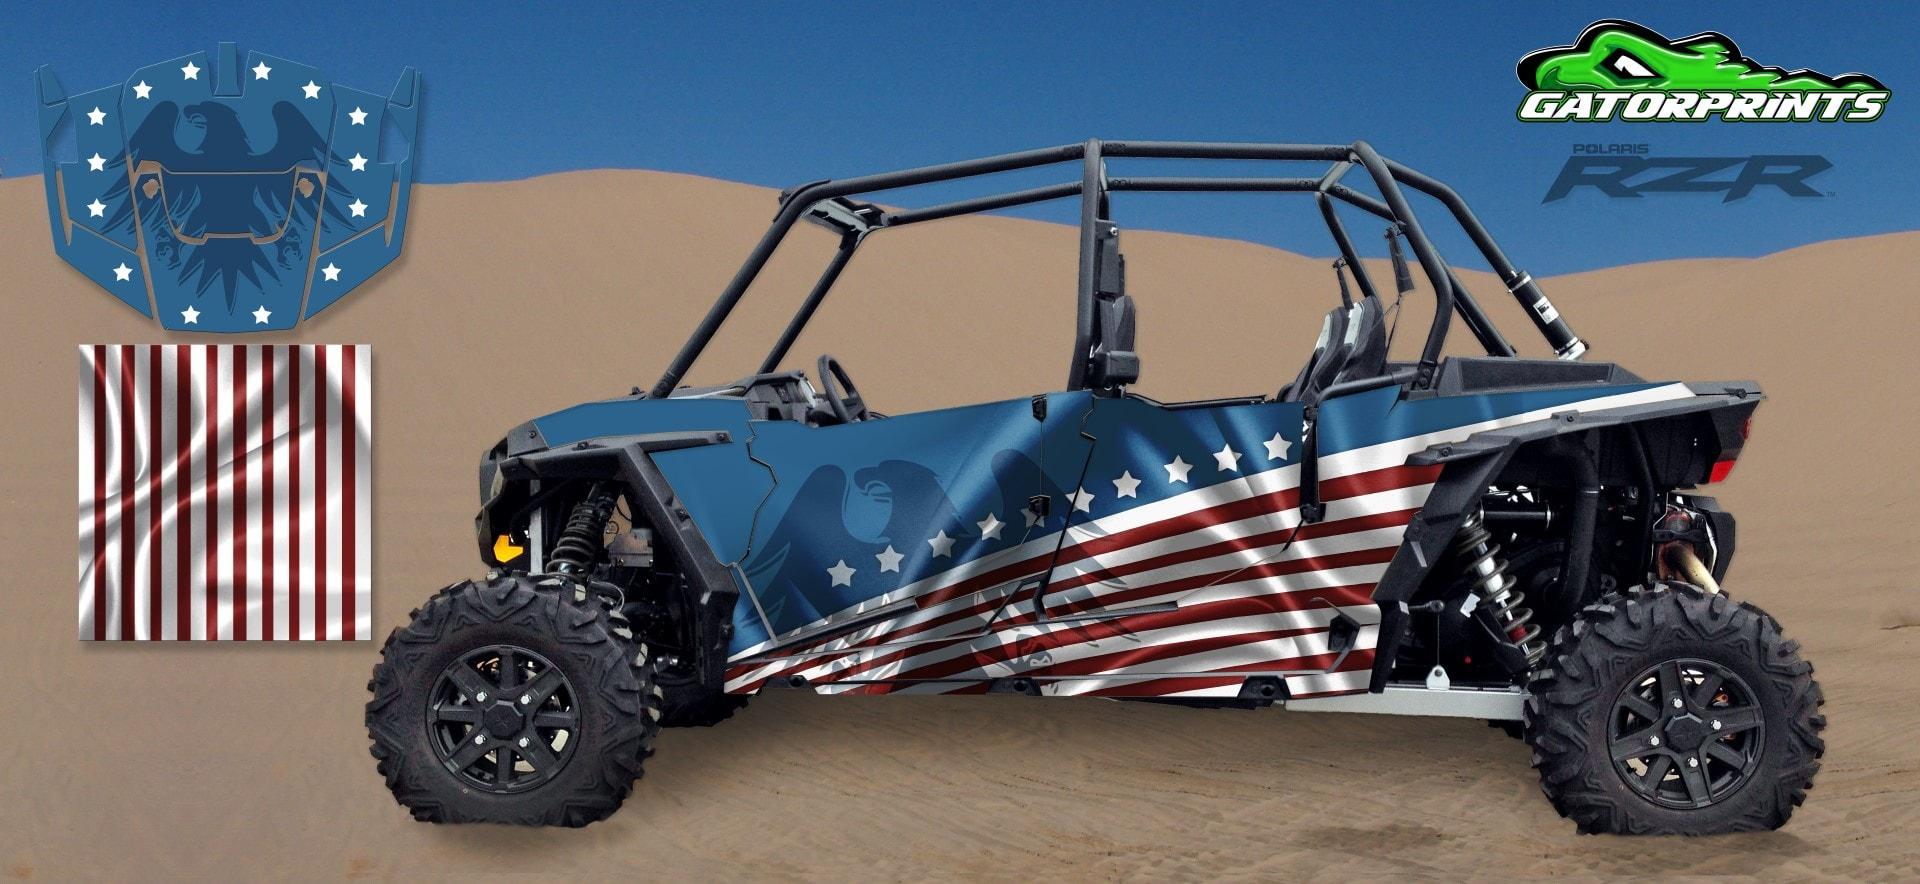 Polaris RZR XP 4 1000 Decal Kits | USA American Flag Design